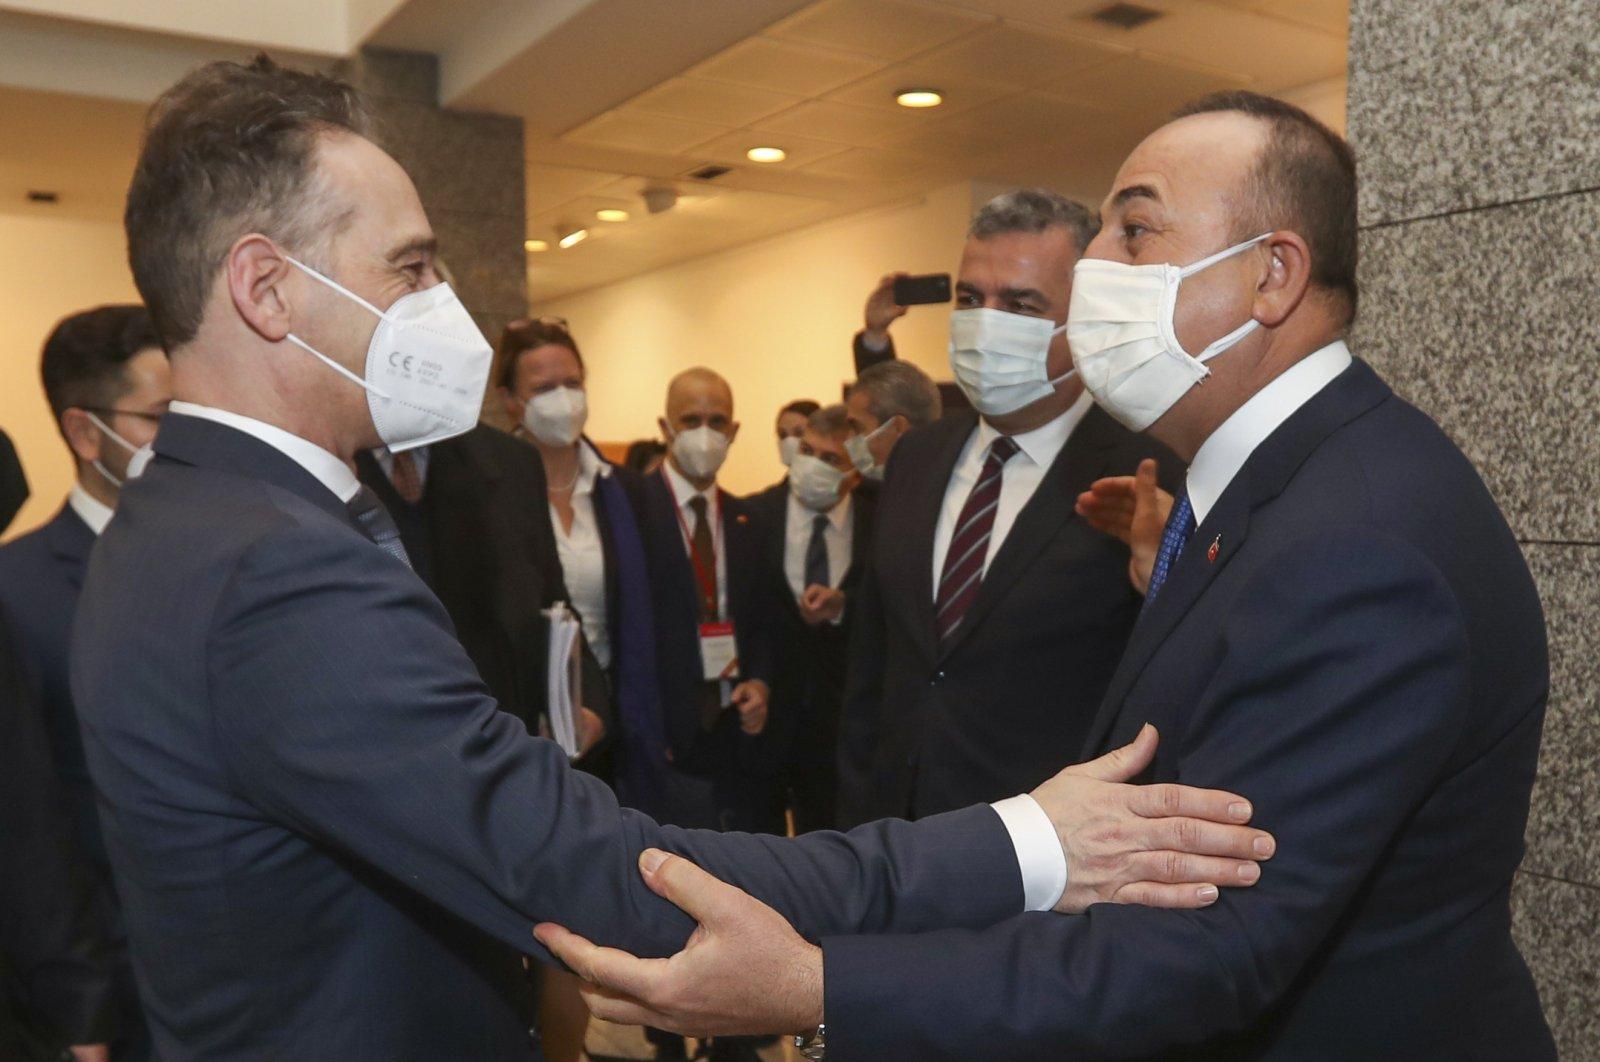 Turkey's Foreign Minister Mevlüt Çavuşoğlu (R) greets Germany's Foreign Minister Heiko Maas (L) prior to their meeting, in the capital Ankara, Turkey, Jan. 18, 2021. (Turkish Foreign Ministry via AP Photo)